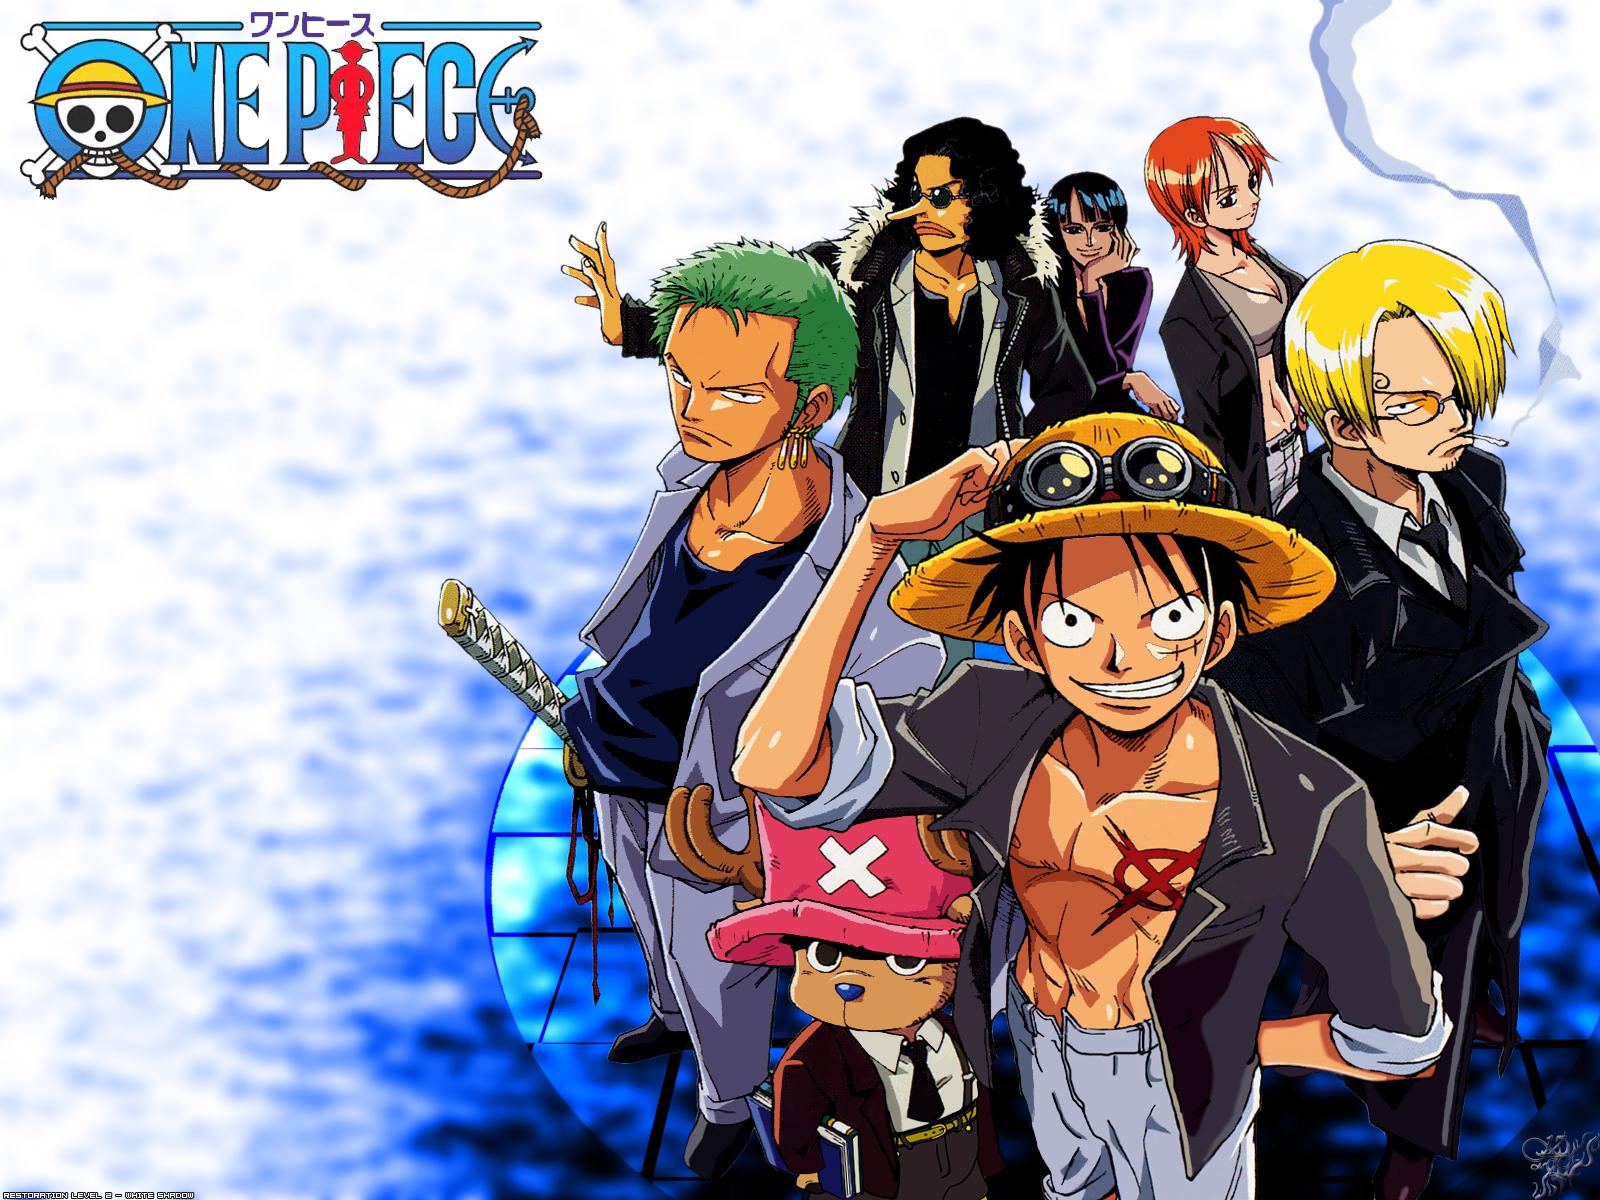 Estes Wallpapers so do anime One Piece espero que gostem 1600x1200